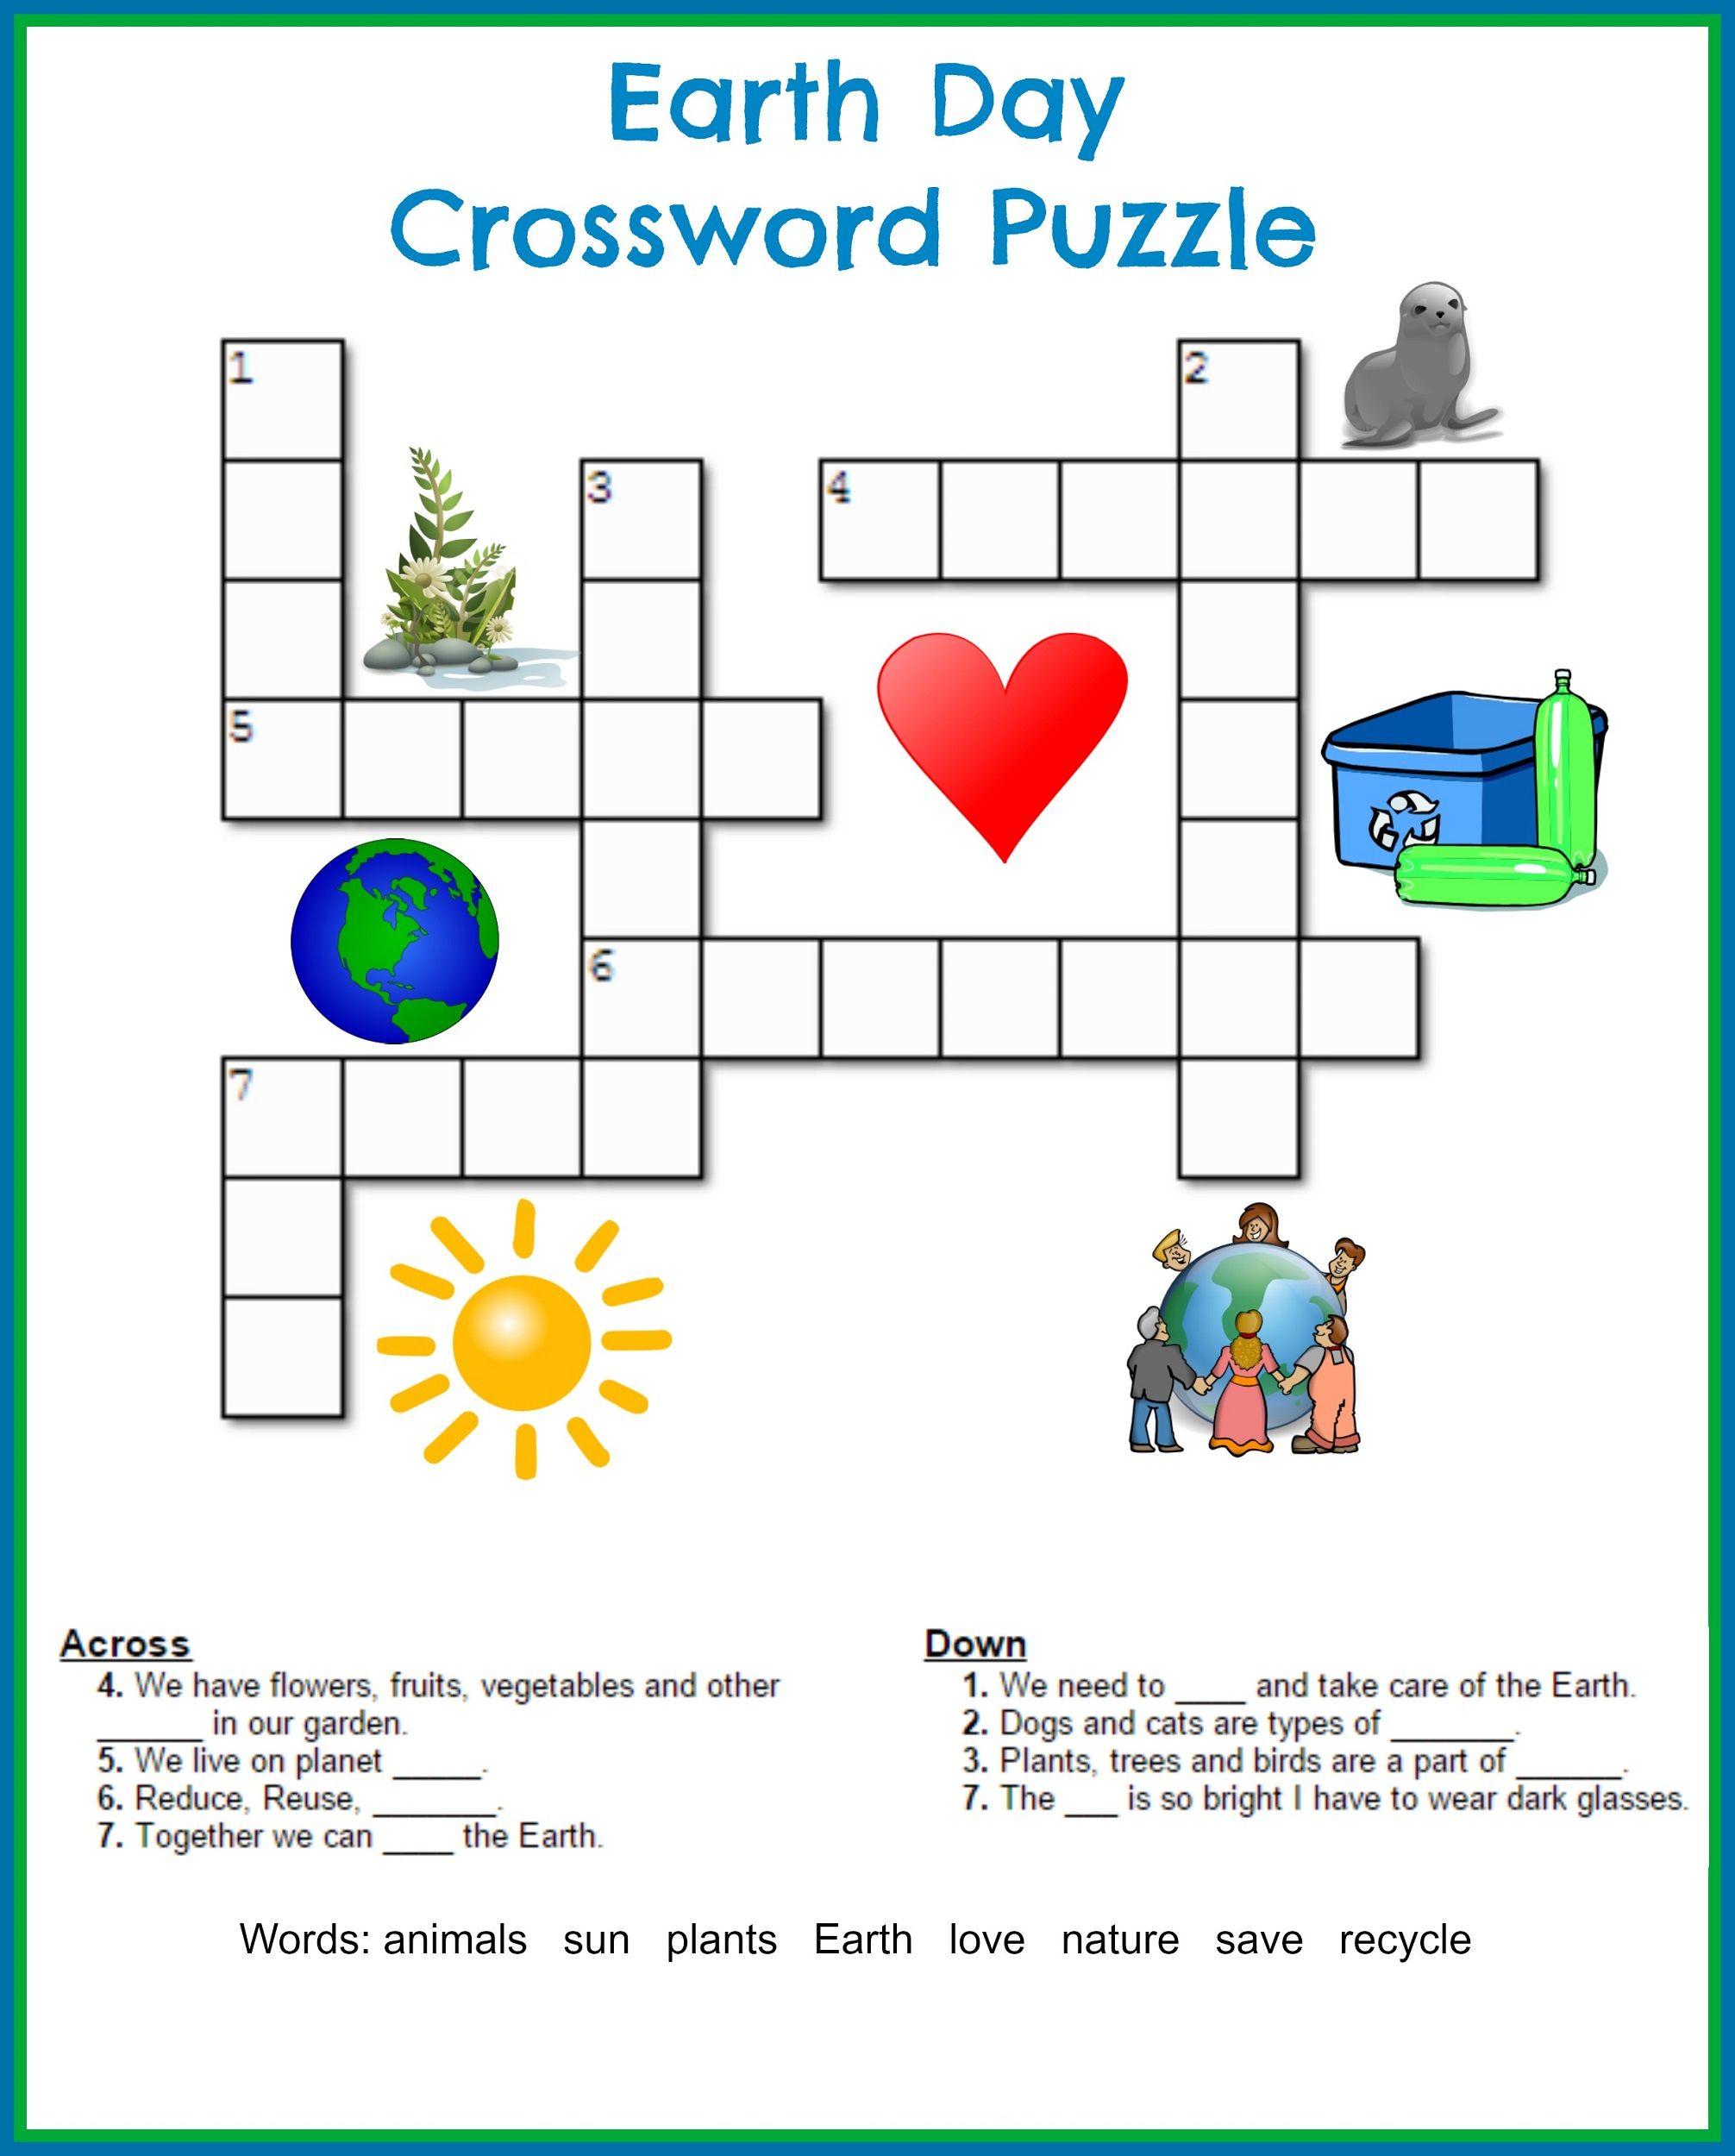 Printable Crossword Puzzles Kids | Crossword Puzzles On Earth - Printable Crossword Puzzles For 6 Year Olds